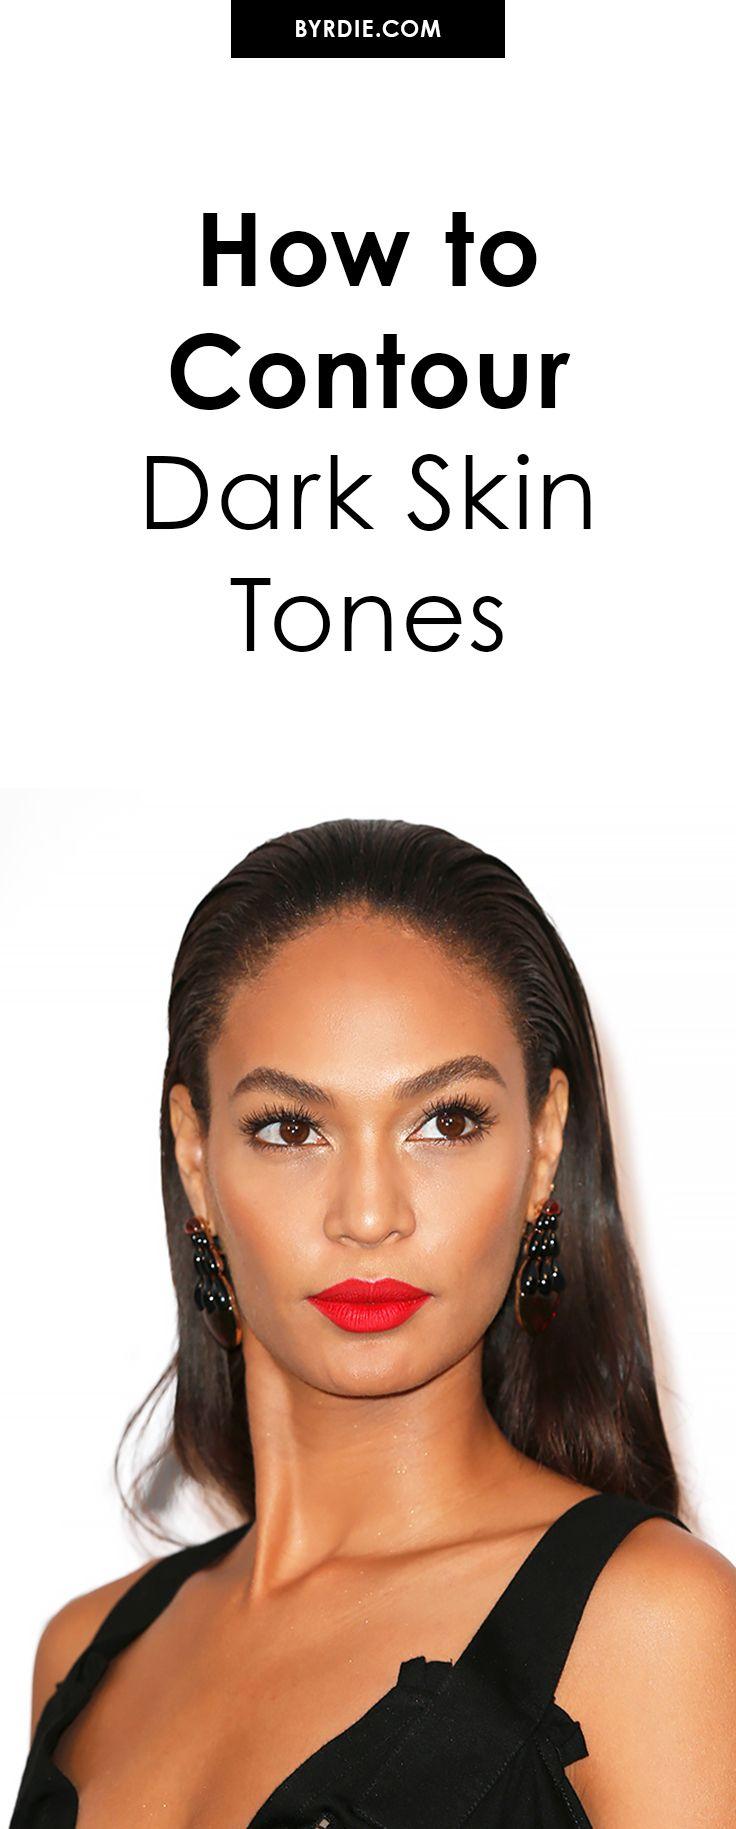 How to Contour Dark Skin Tones A Top Makeup Artist Spills